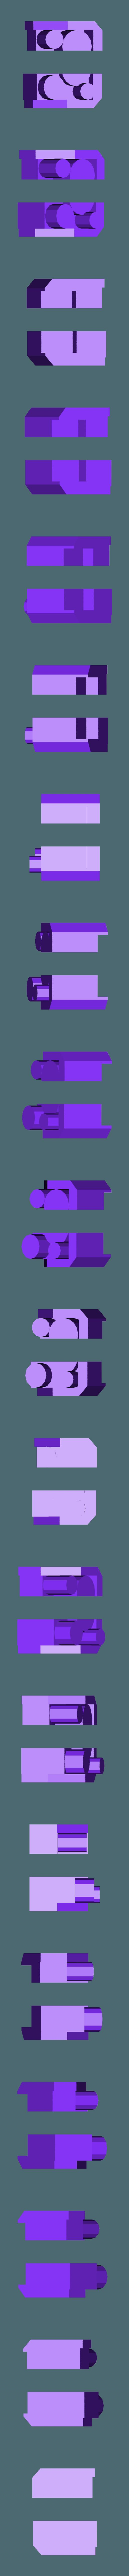 mk_d-4lt_pc_sensor.stl Download free STL file Big Plasma Cannon Turret • 3D printing design, JtStrait72